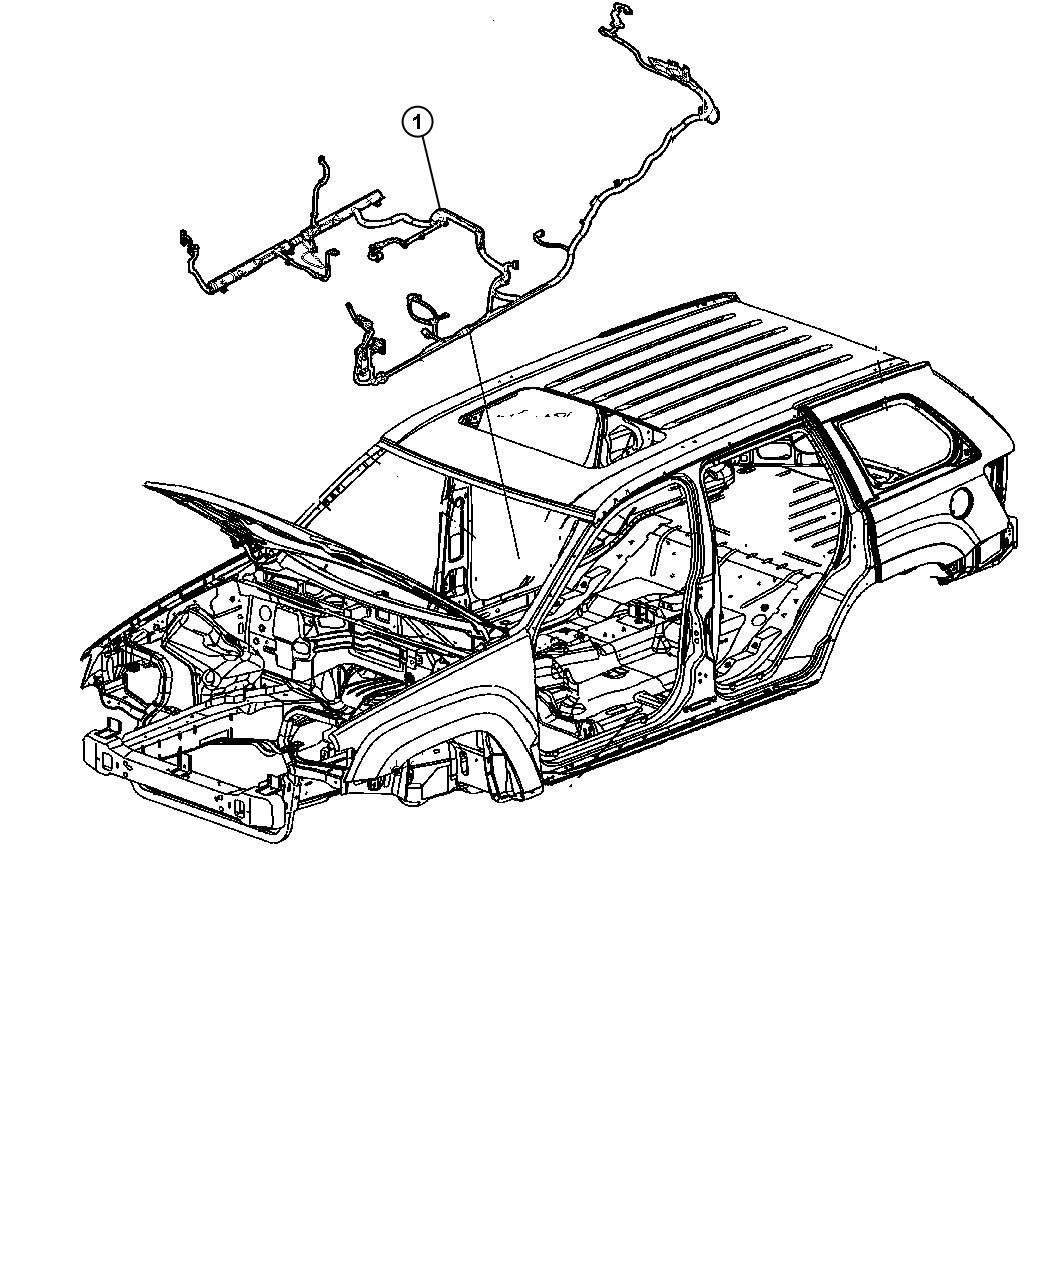 Jeep Grand Cherokee Wiring. Body. Rear, way, window